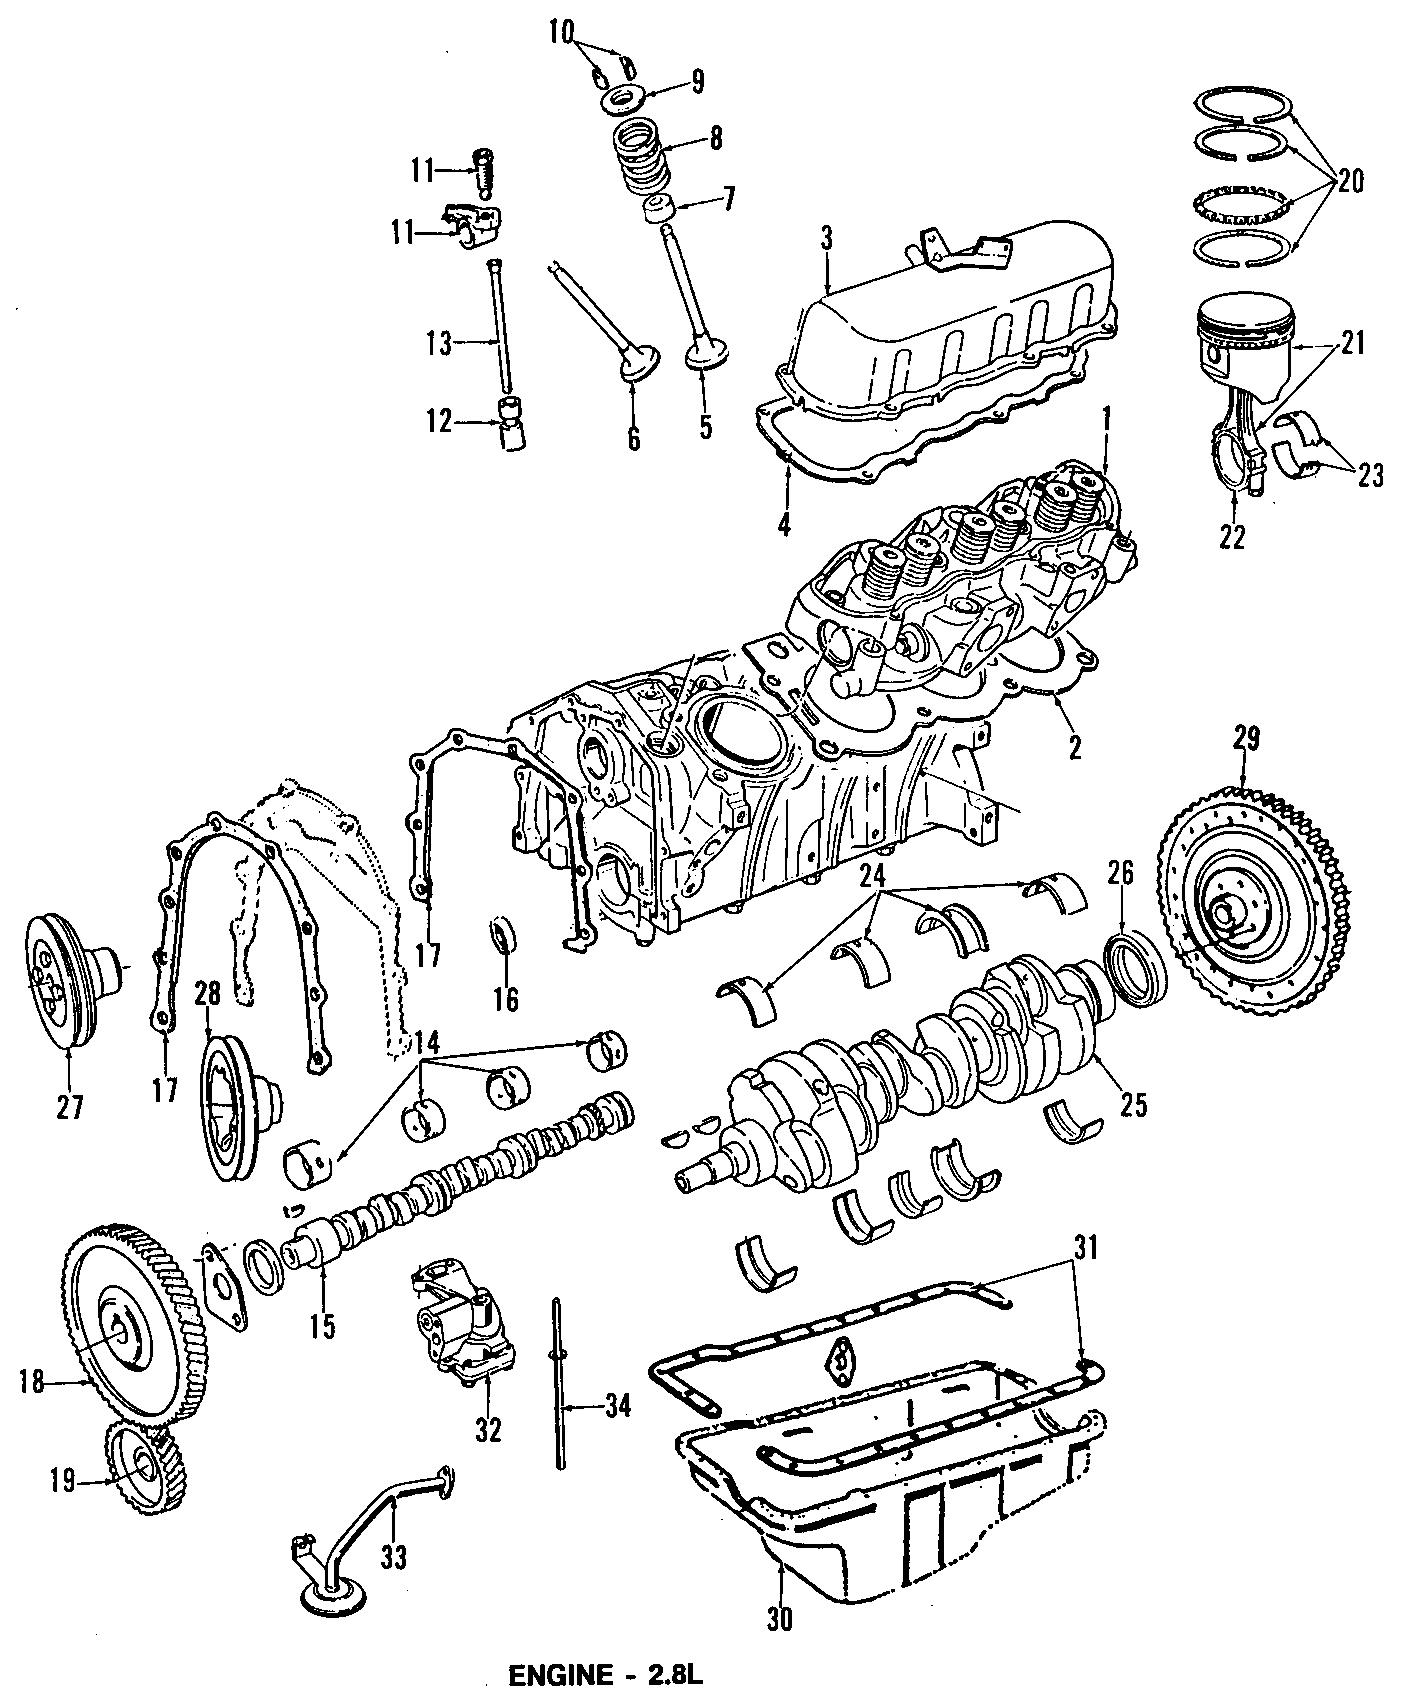 Ford Aerostar Gear Camshaft Timing Sprocket Engine 4